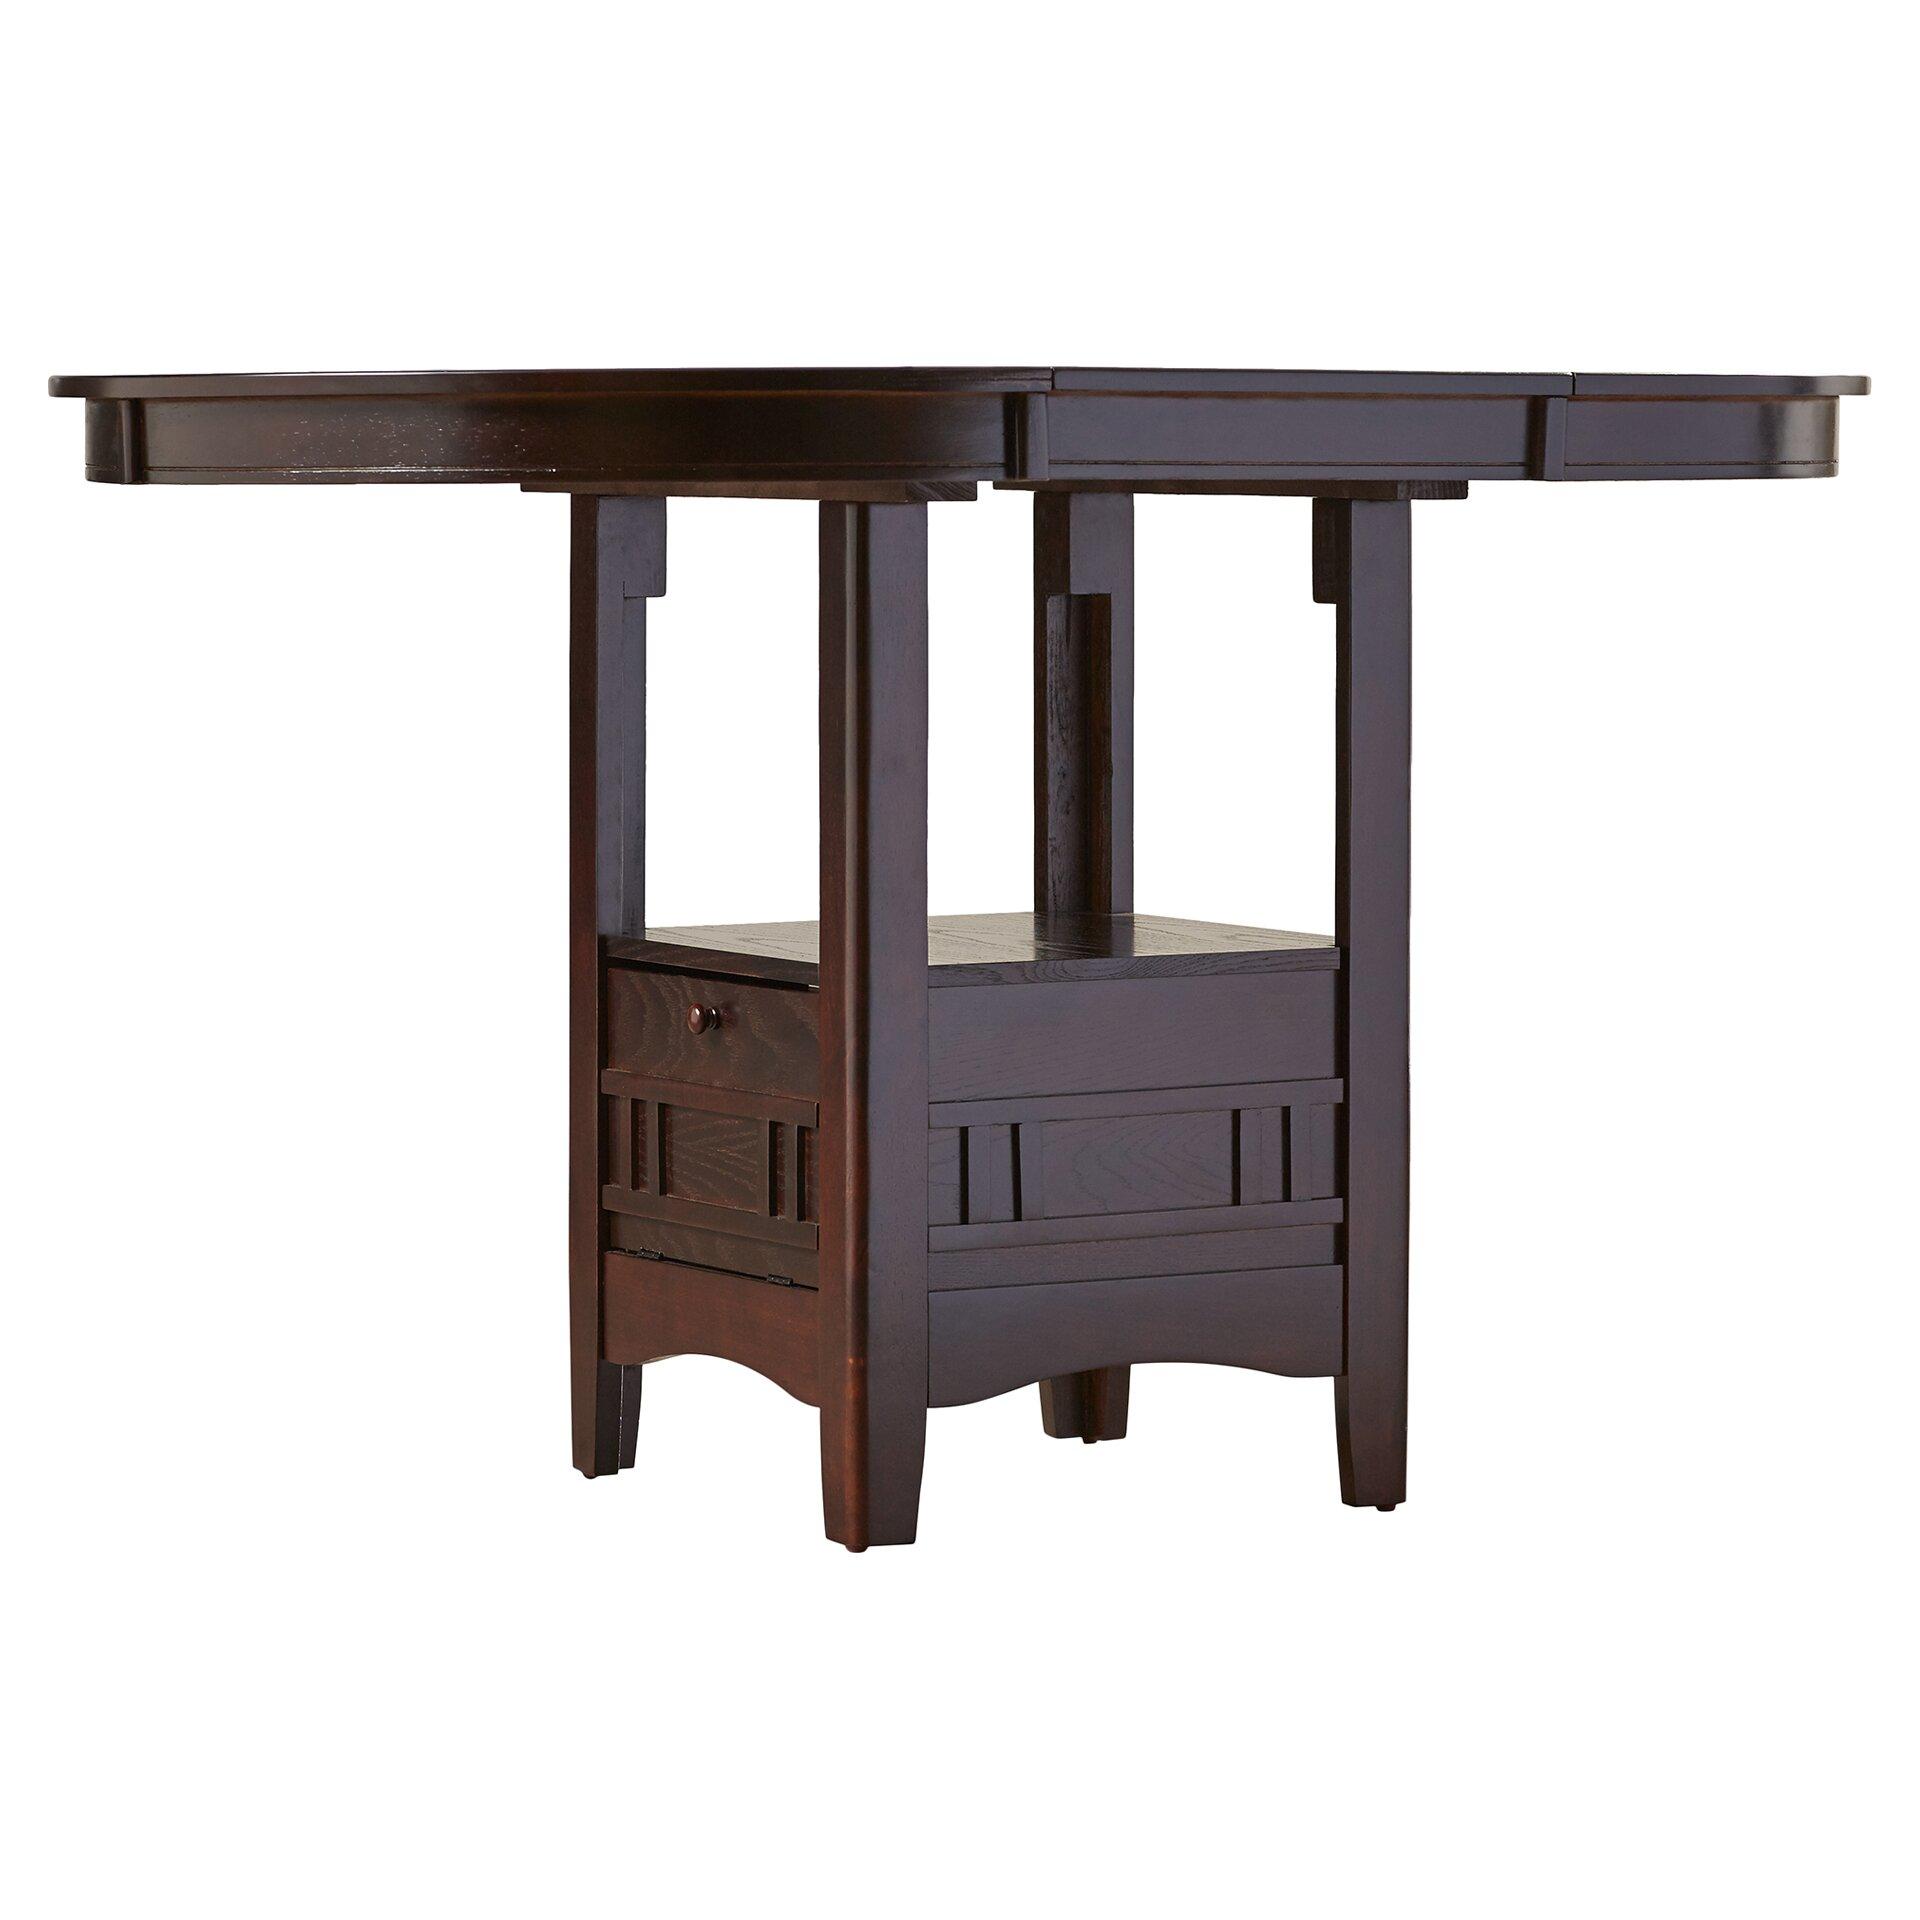 Alcott hill norwalk counter height extendable dining table for Extendable dining table